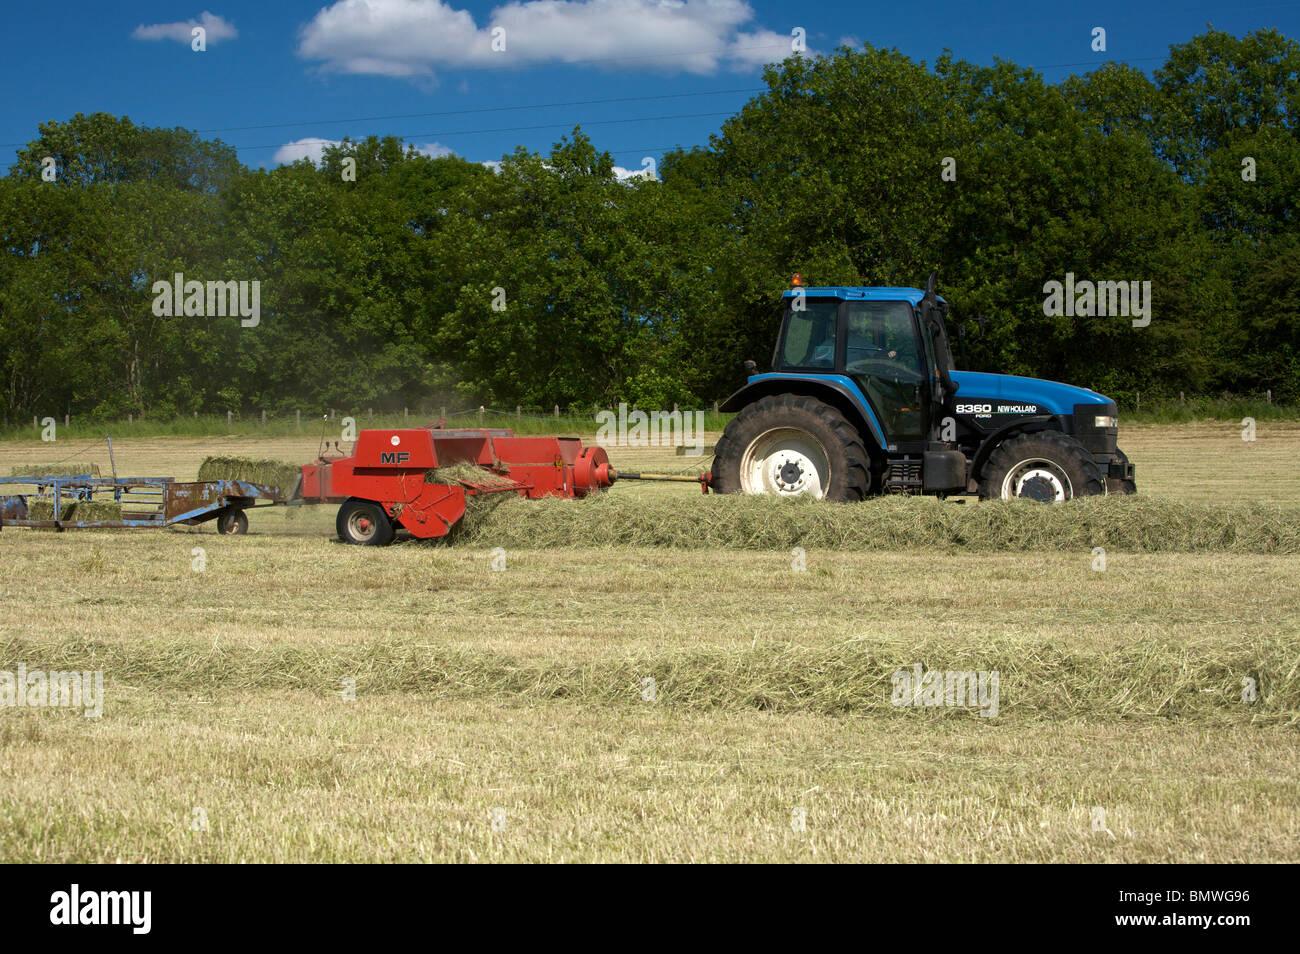 Baling Hay - Stock Image